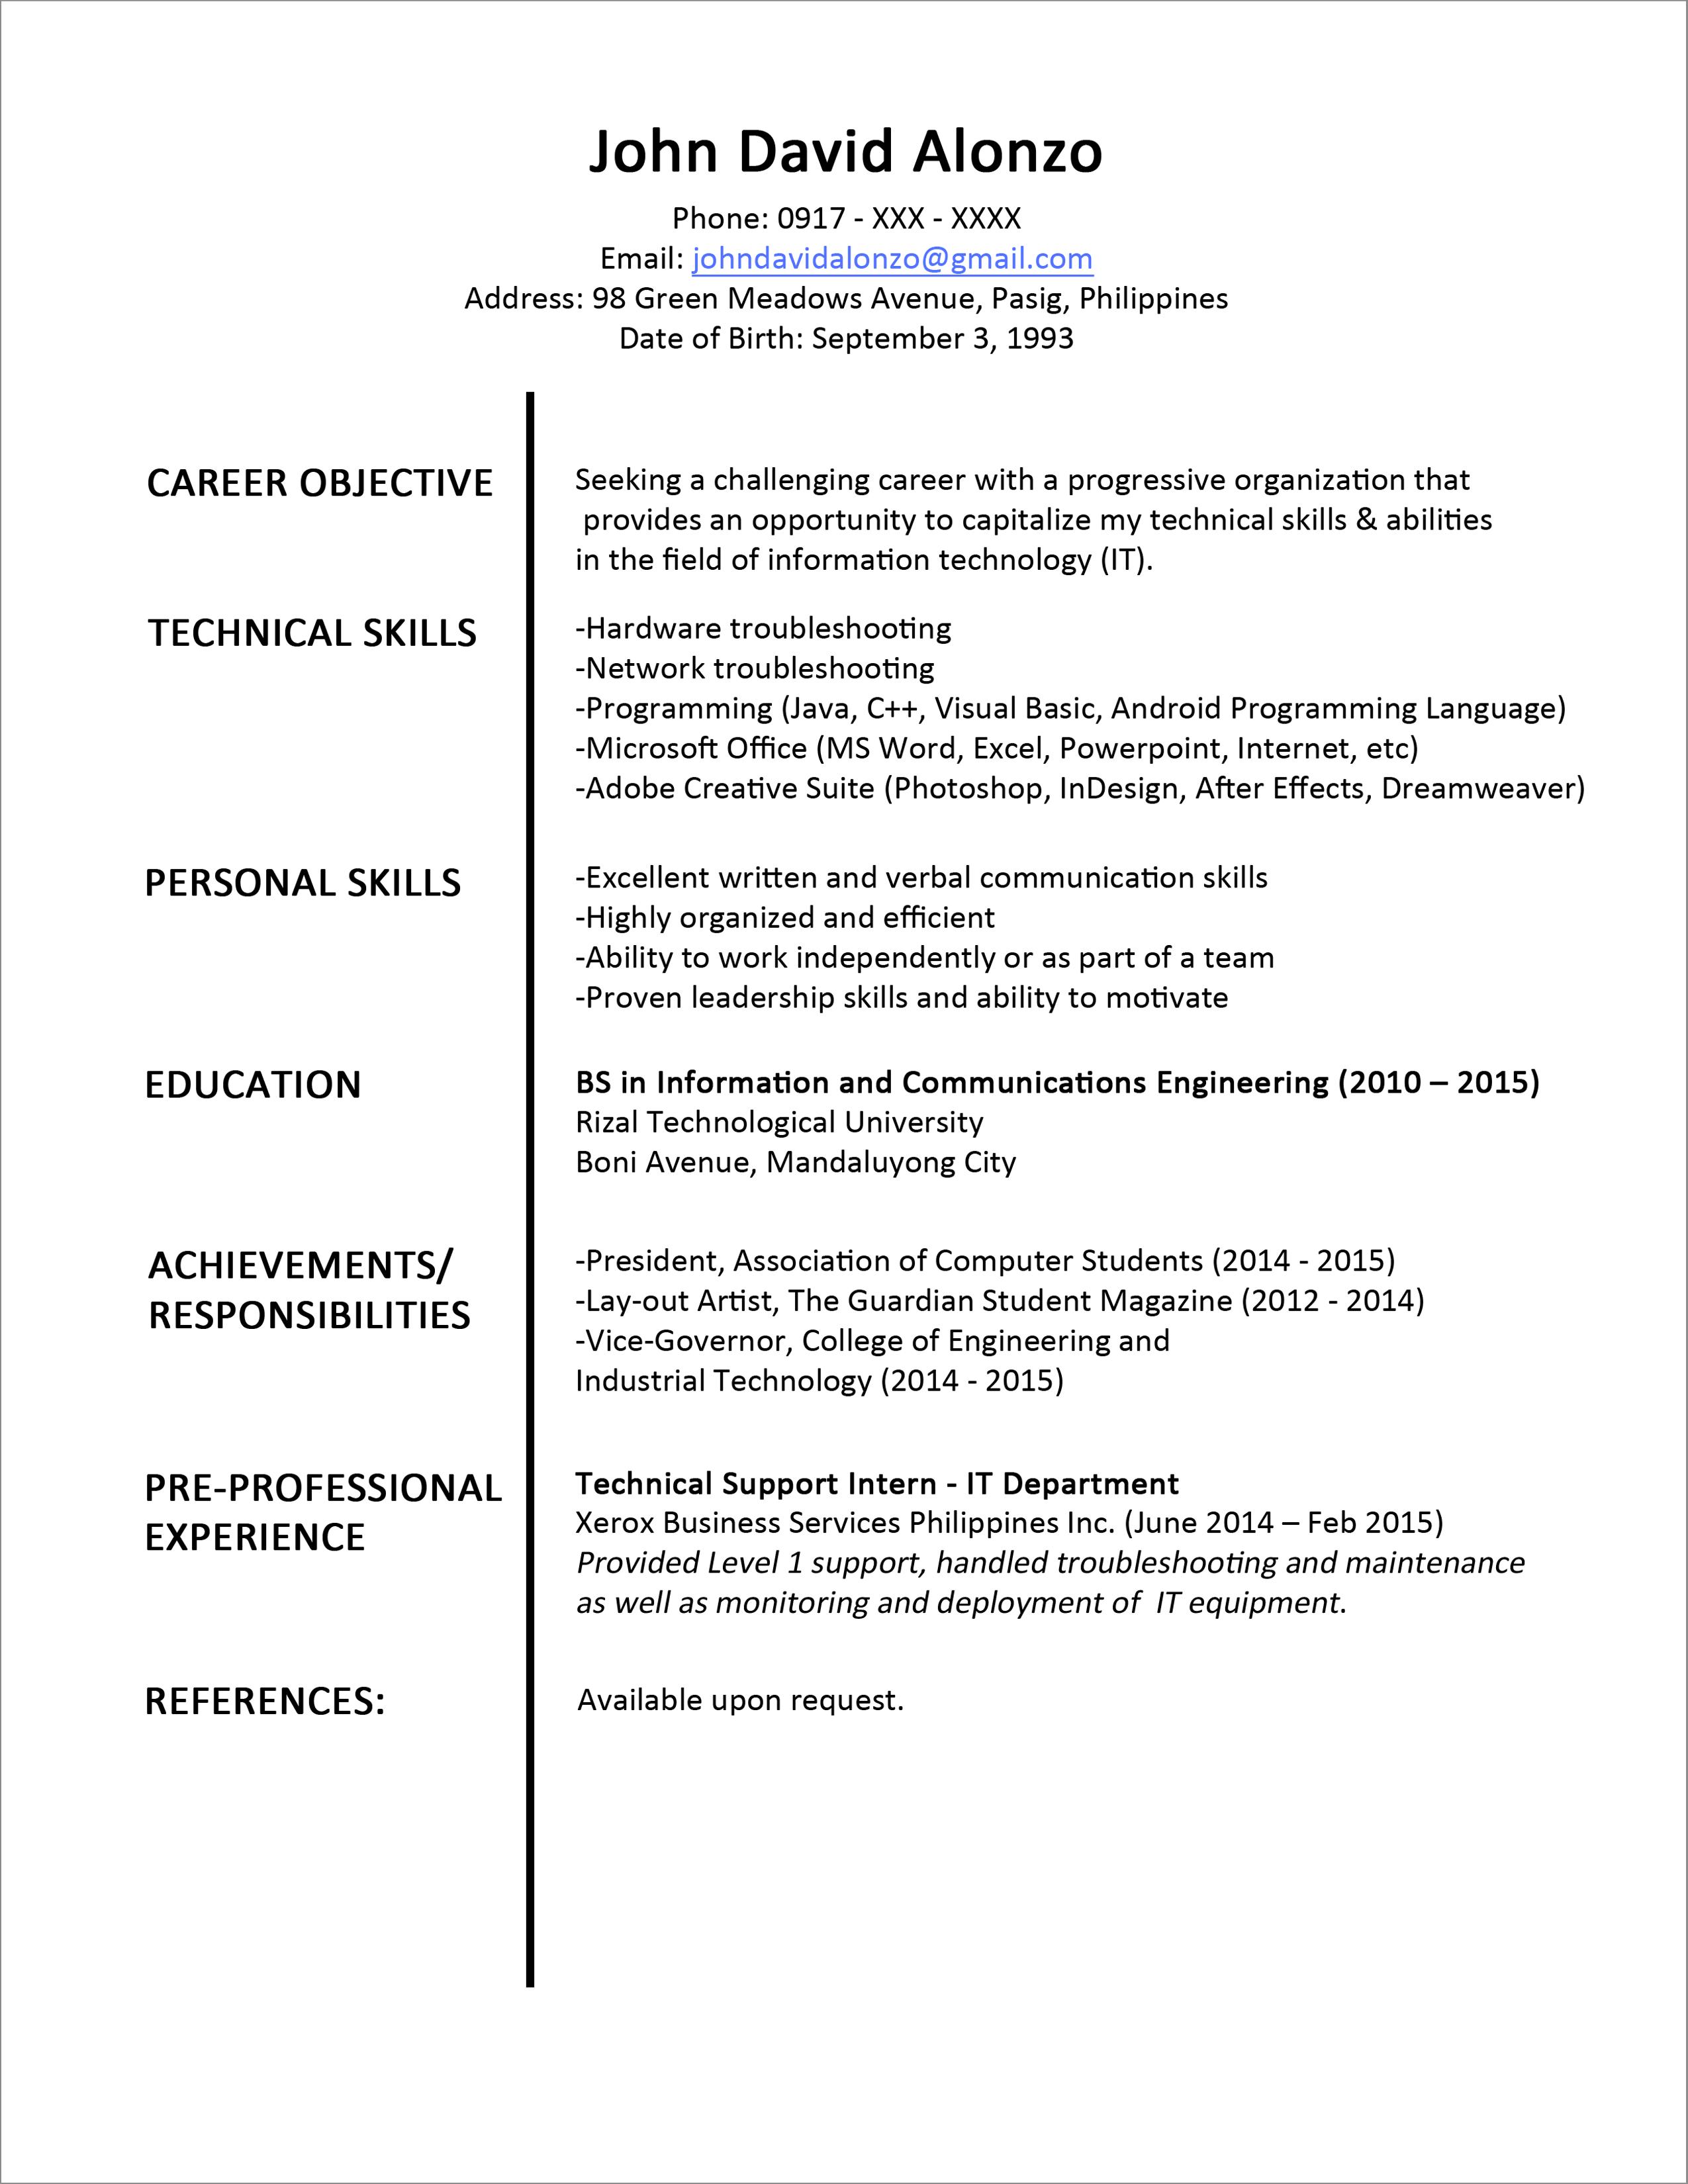 Personal Resume Templates Jobstreet  Pinterest  Resume Format Template And Sample Resume Format